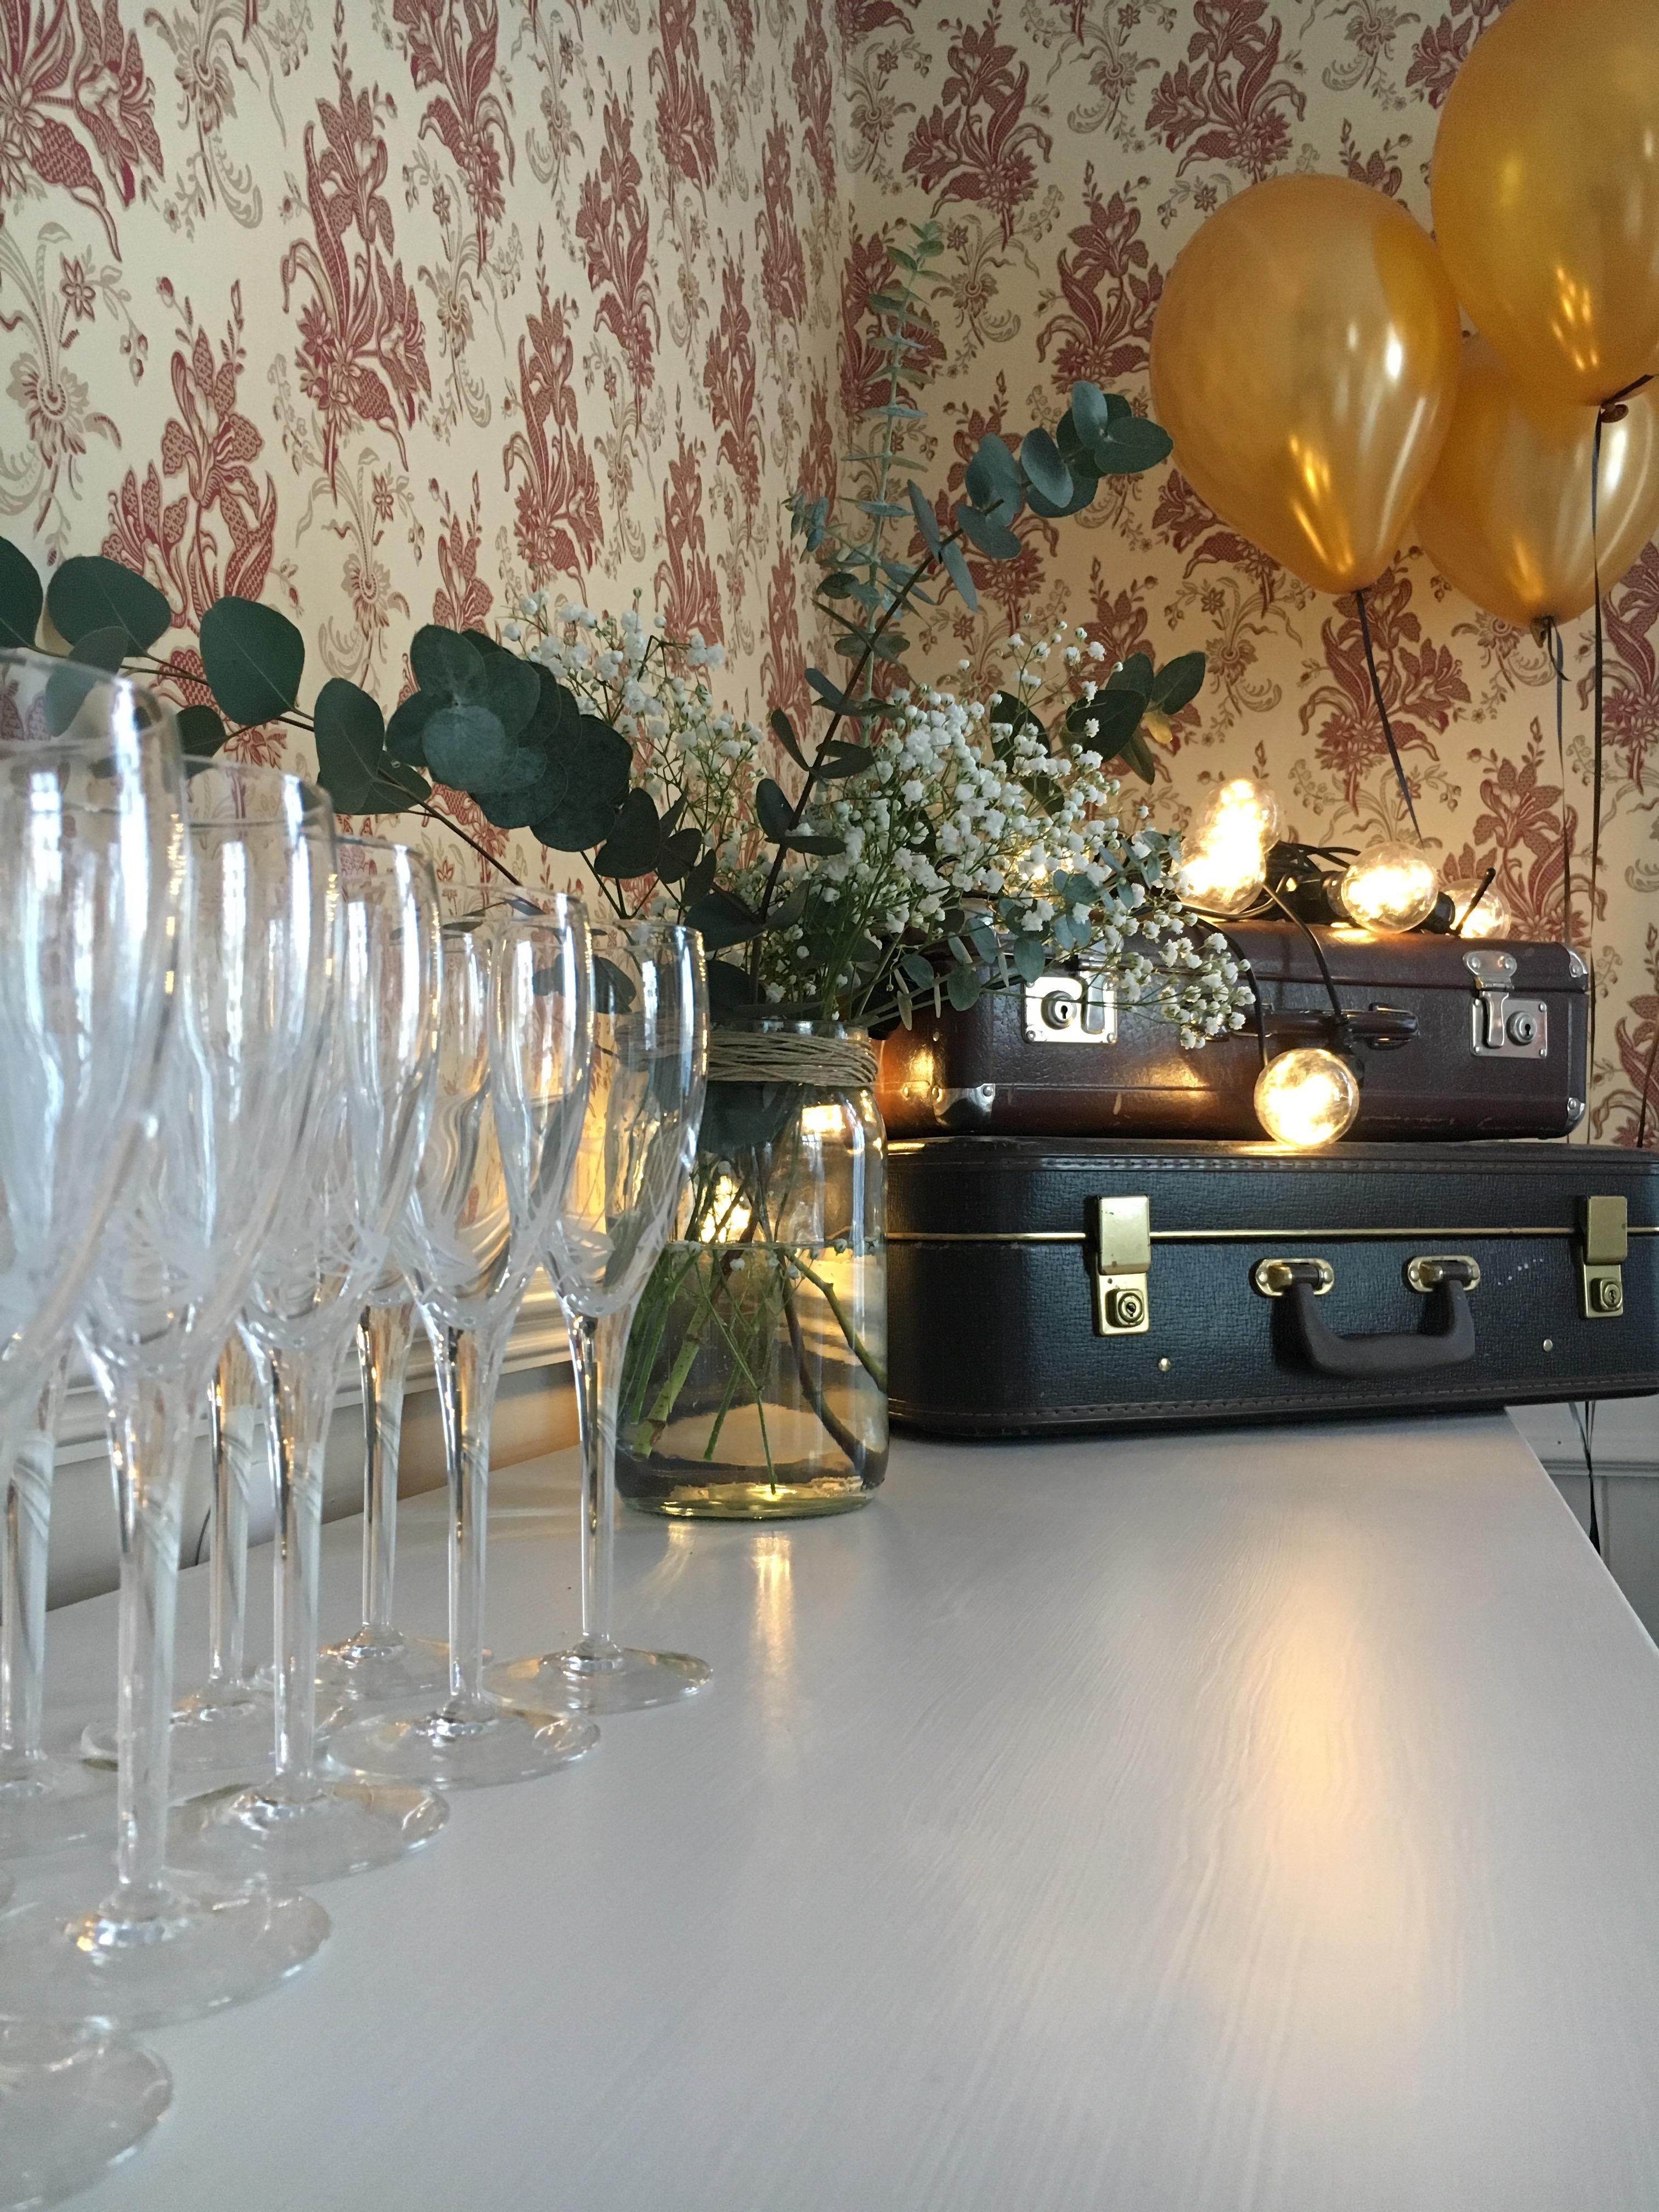 30 år fest Annikas 30 års fest! | Bland Damm & Dekor 30 år fest